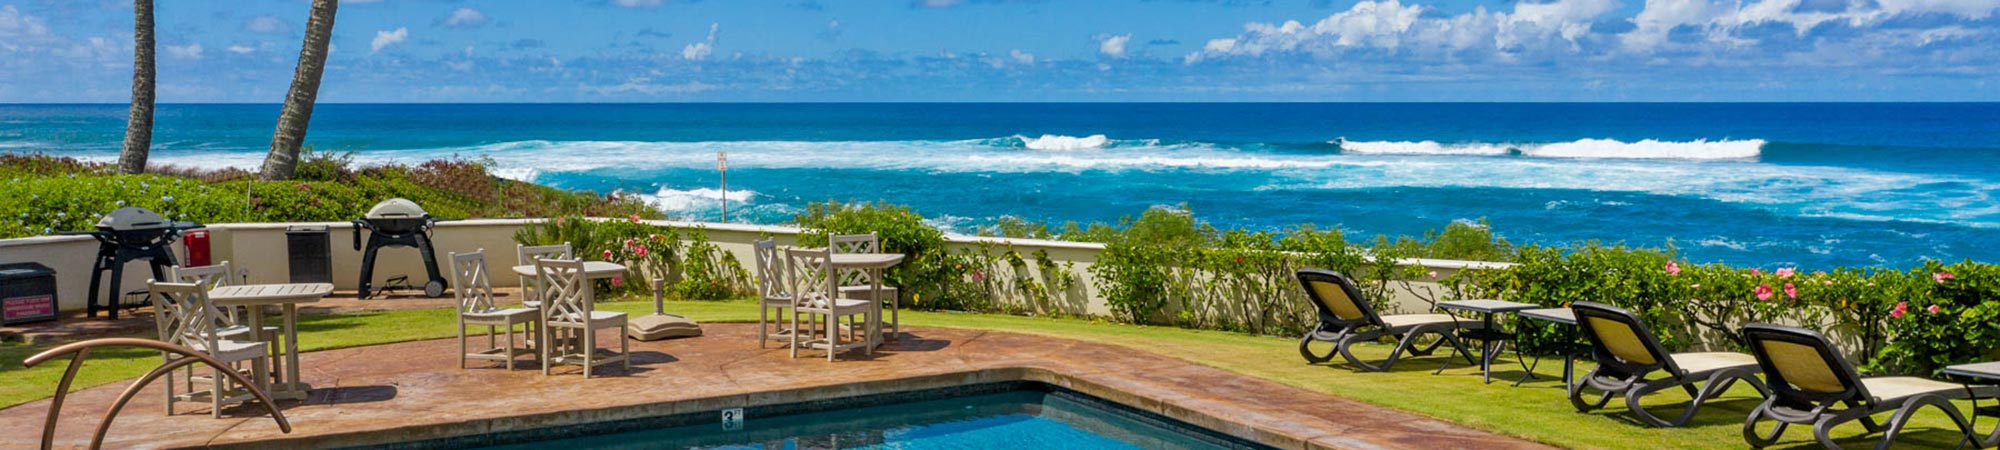 Alihi Lani oceanfront pool